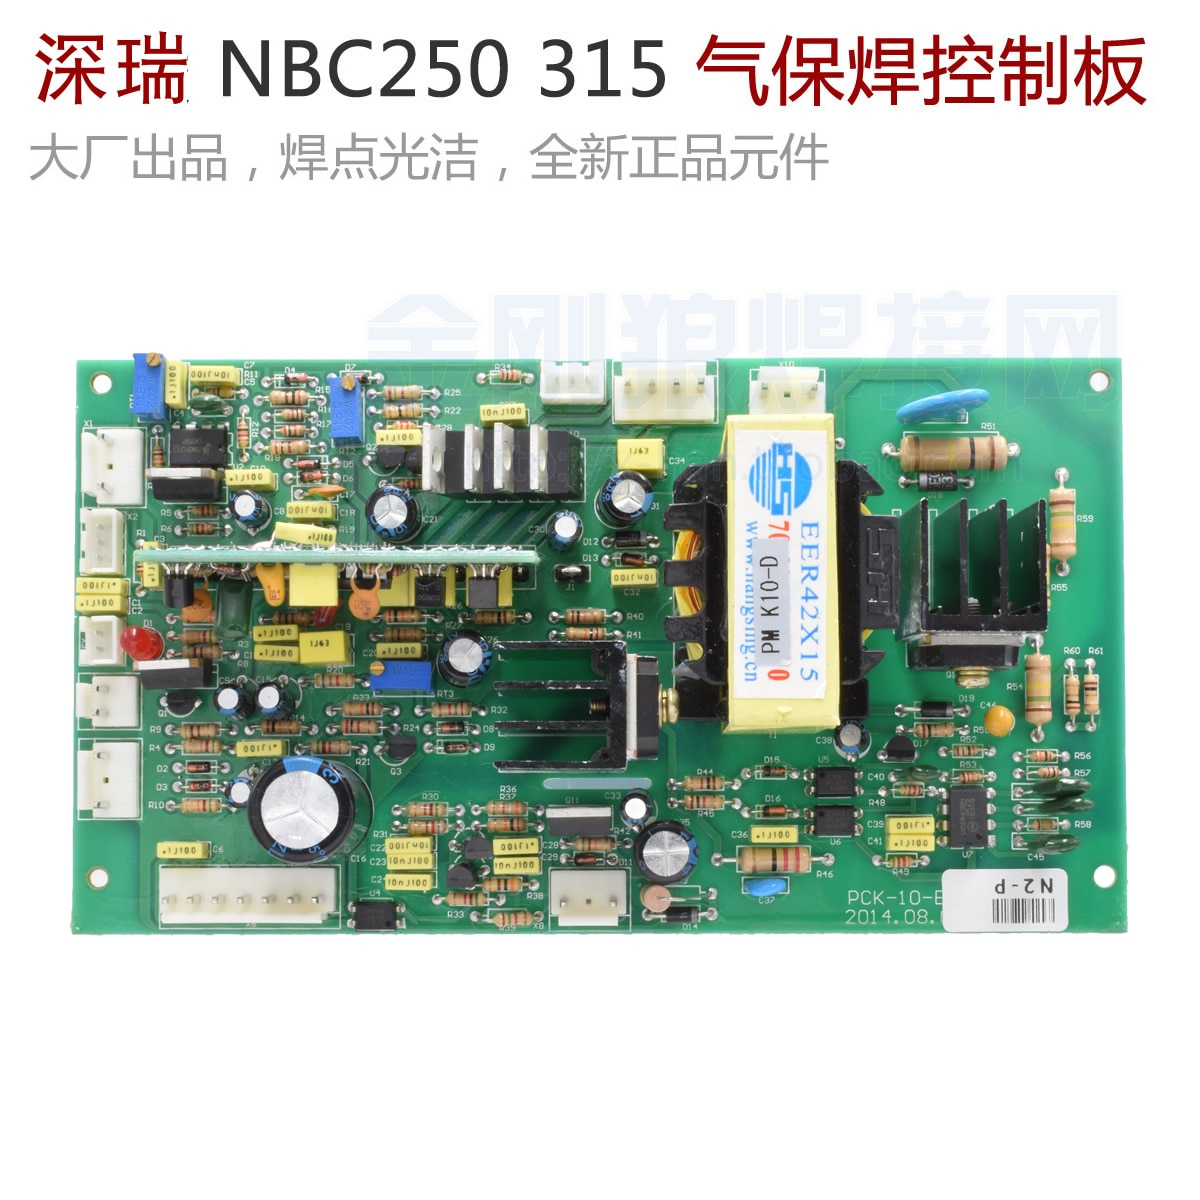 NBC250 315 MOS العاكس CO2 الغاز محمية آلة لحام لوحة تحكم لوحة دوائر كهربائية